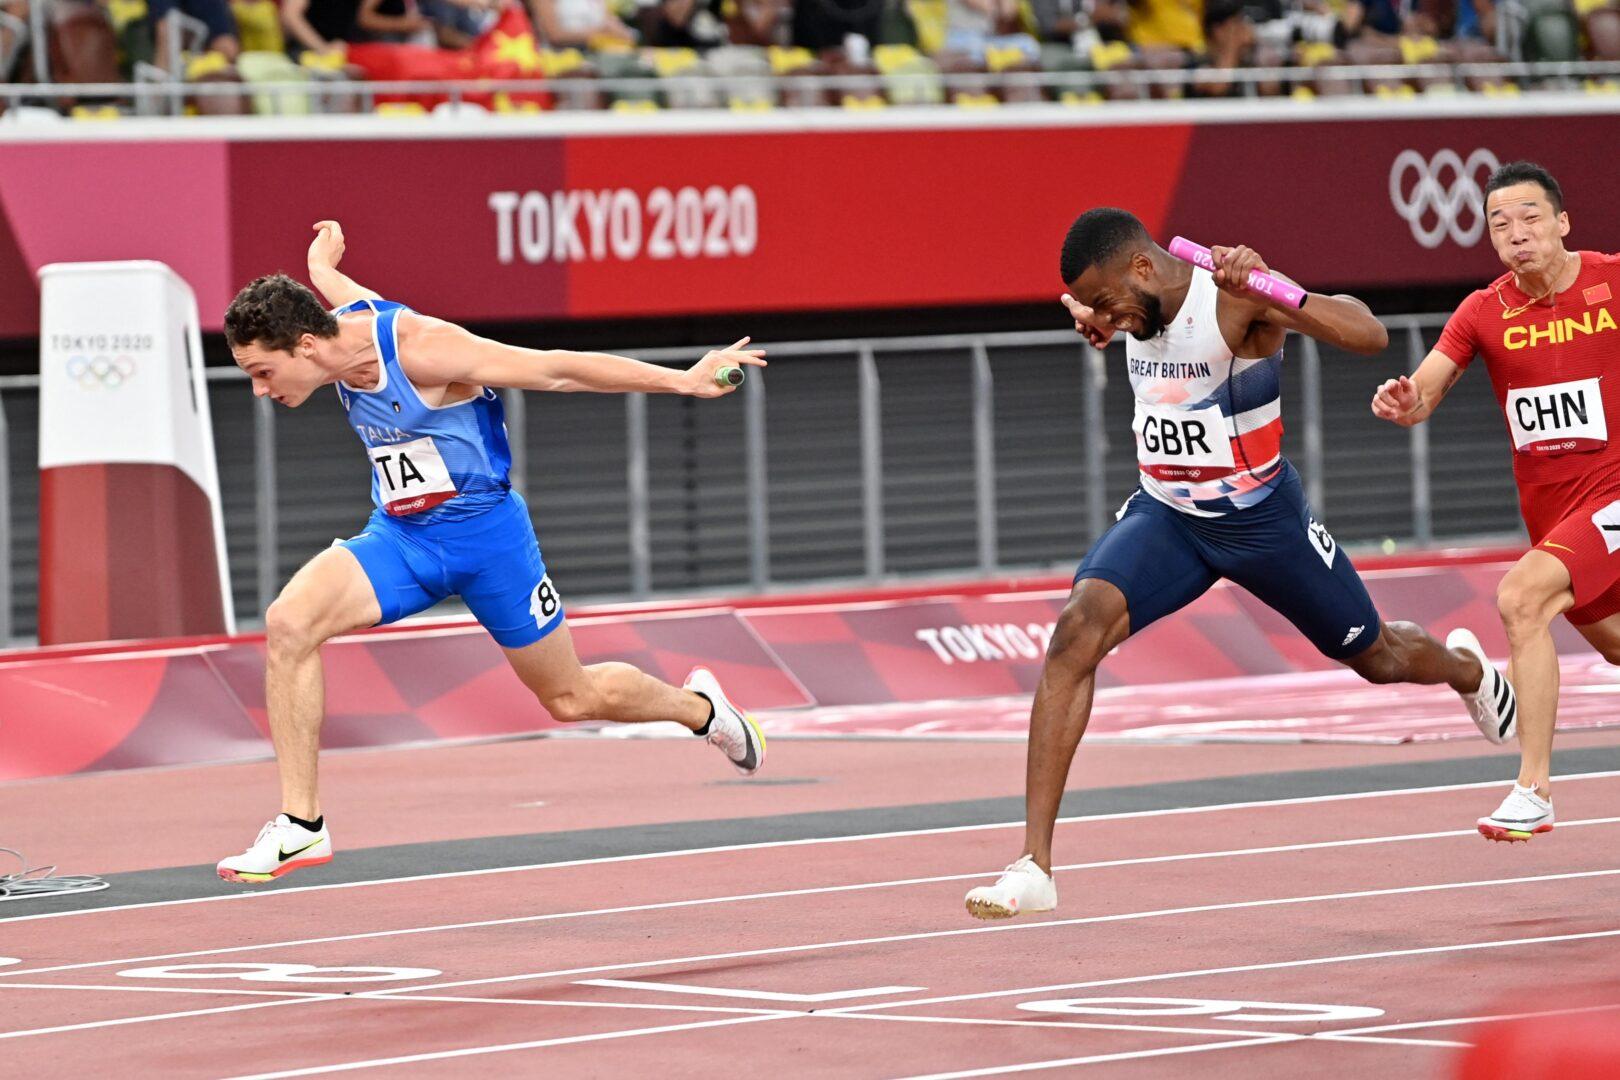 Atletica, la Gran Bretagna perderà l'argento della 4x100